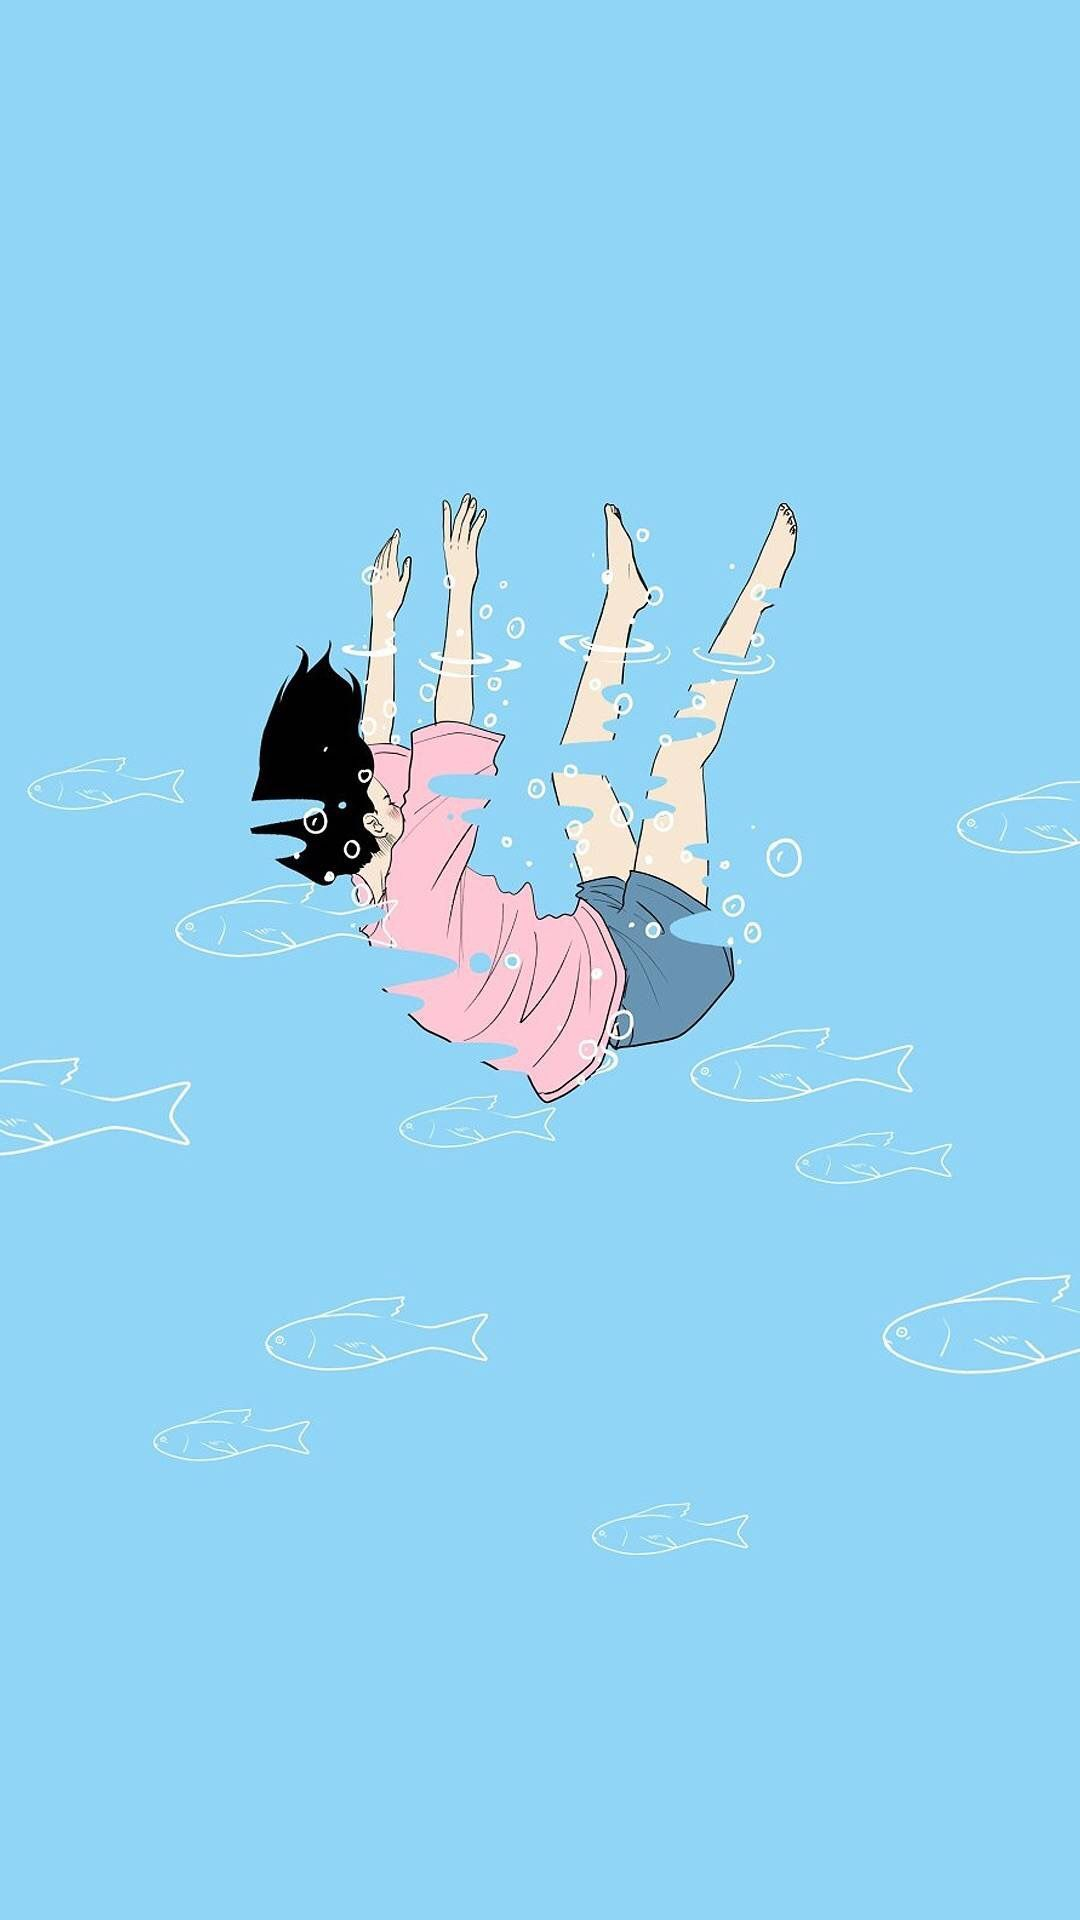 Iphone Lock Sreen Wallpapers Hd From Uploaded By User Anime Wallpaper Kawaii Wallpaper Cartoon Wallpaper